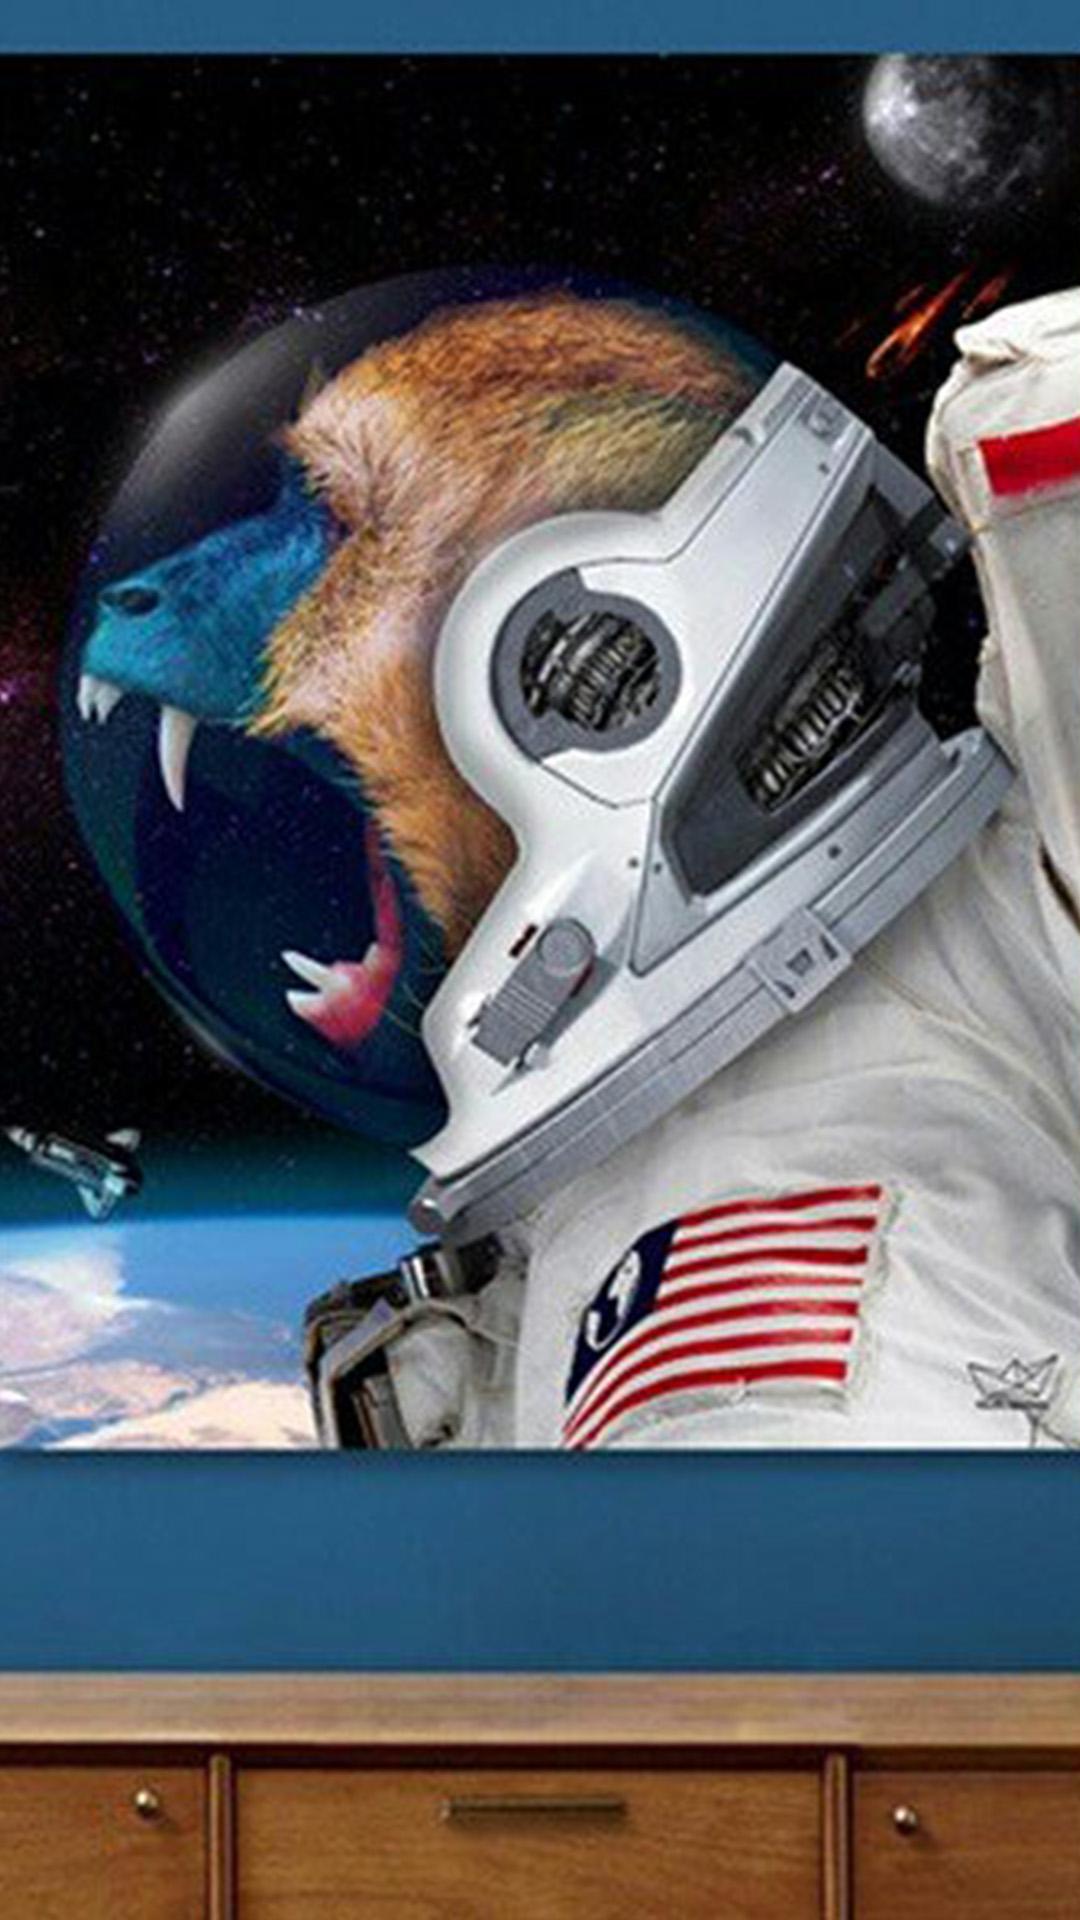 Macaco Astronauta